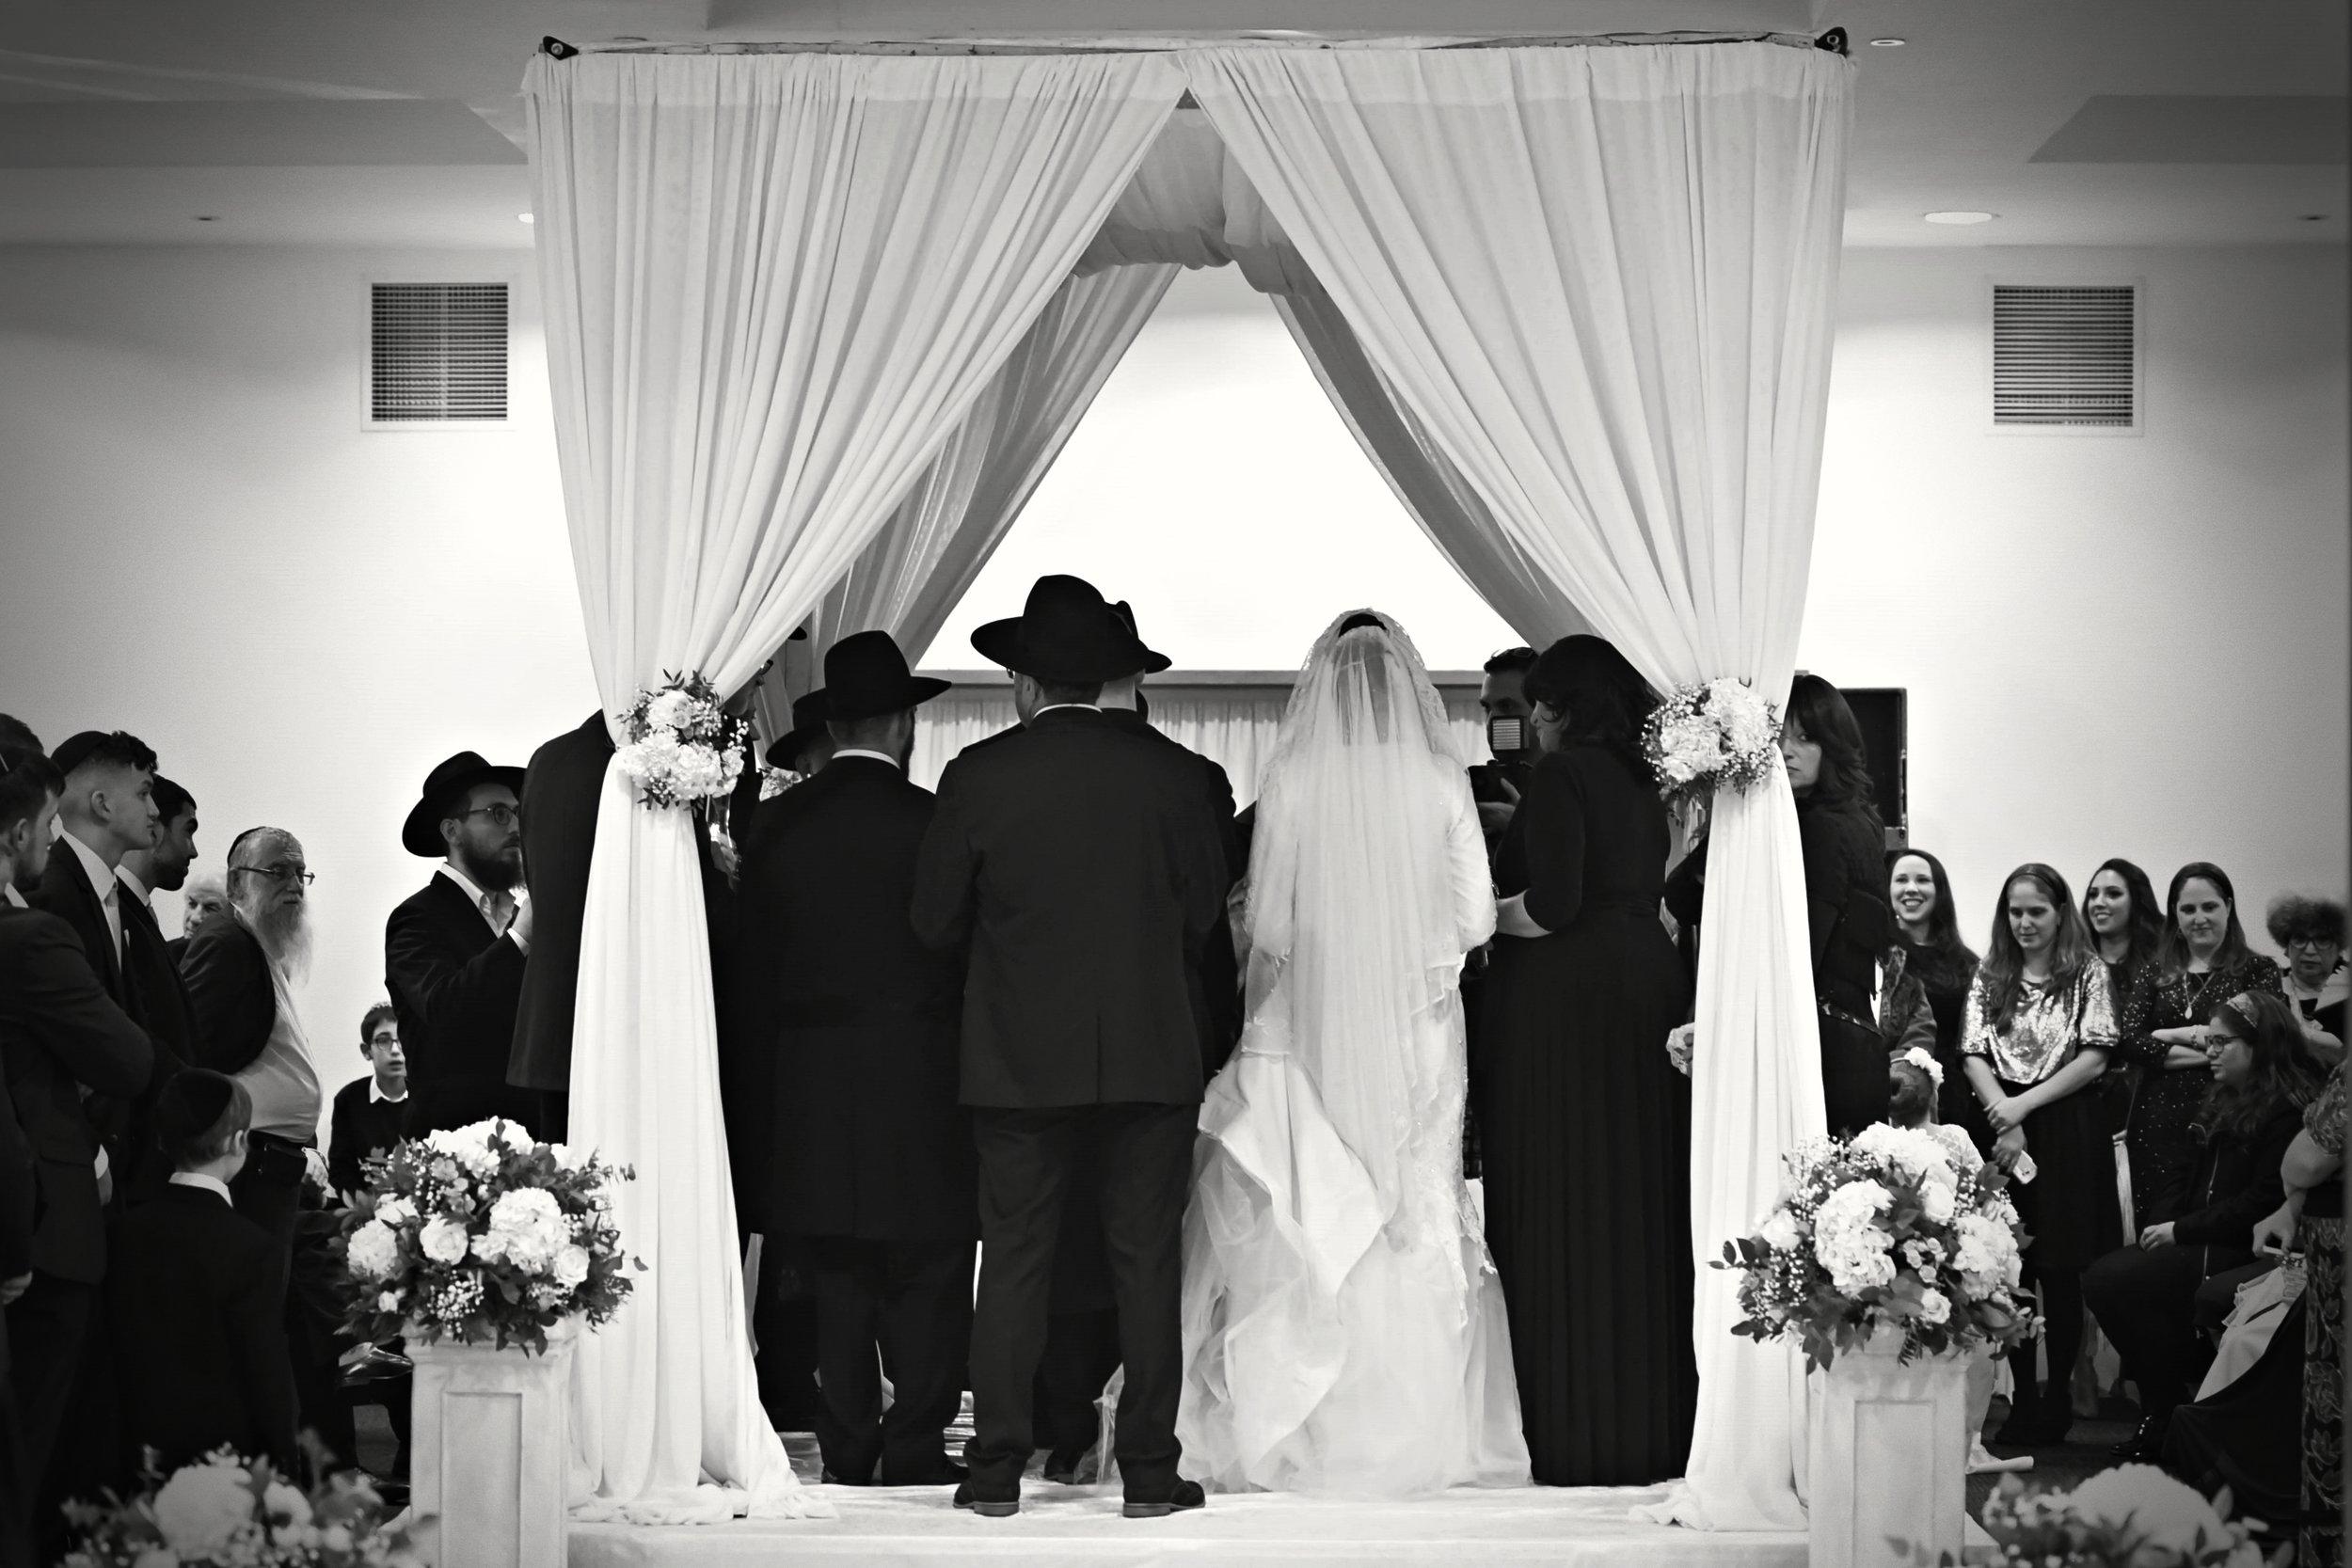 Moshe And Chava Wedding 1.JPG